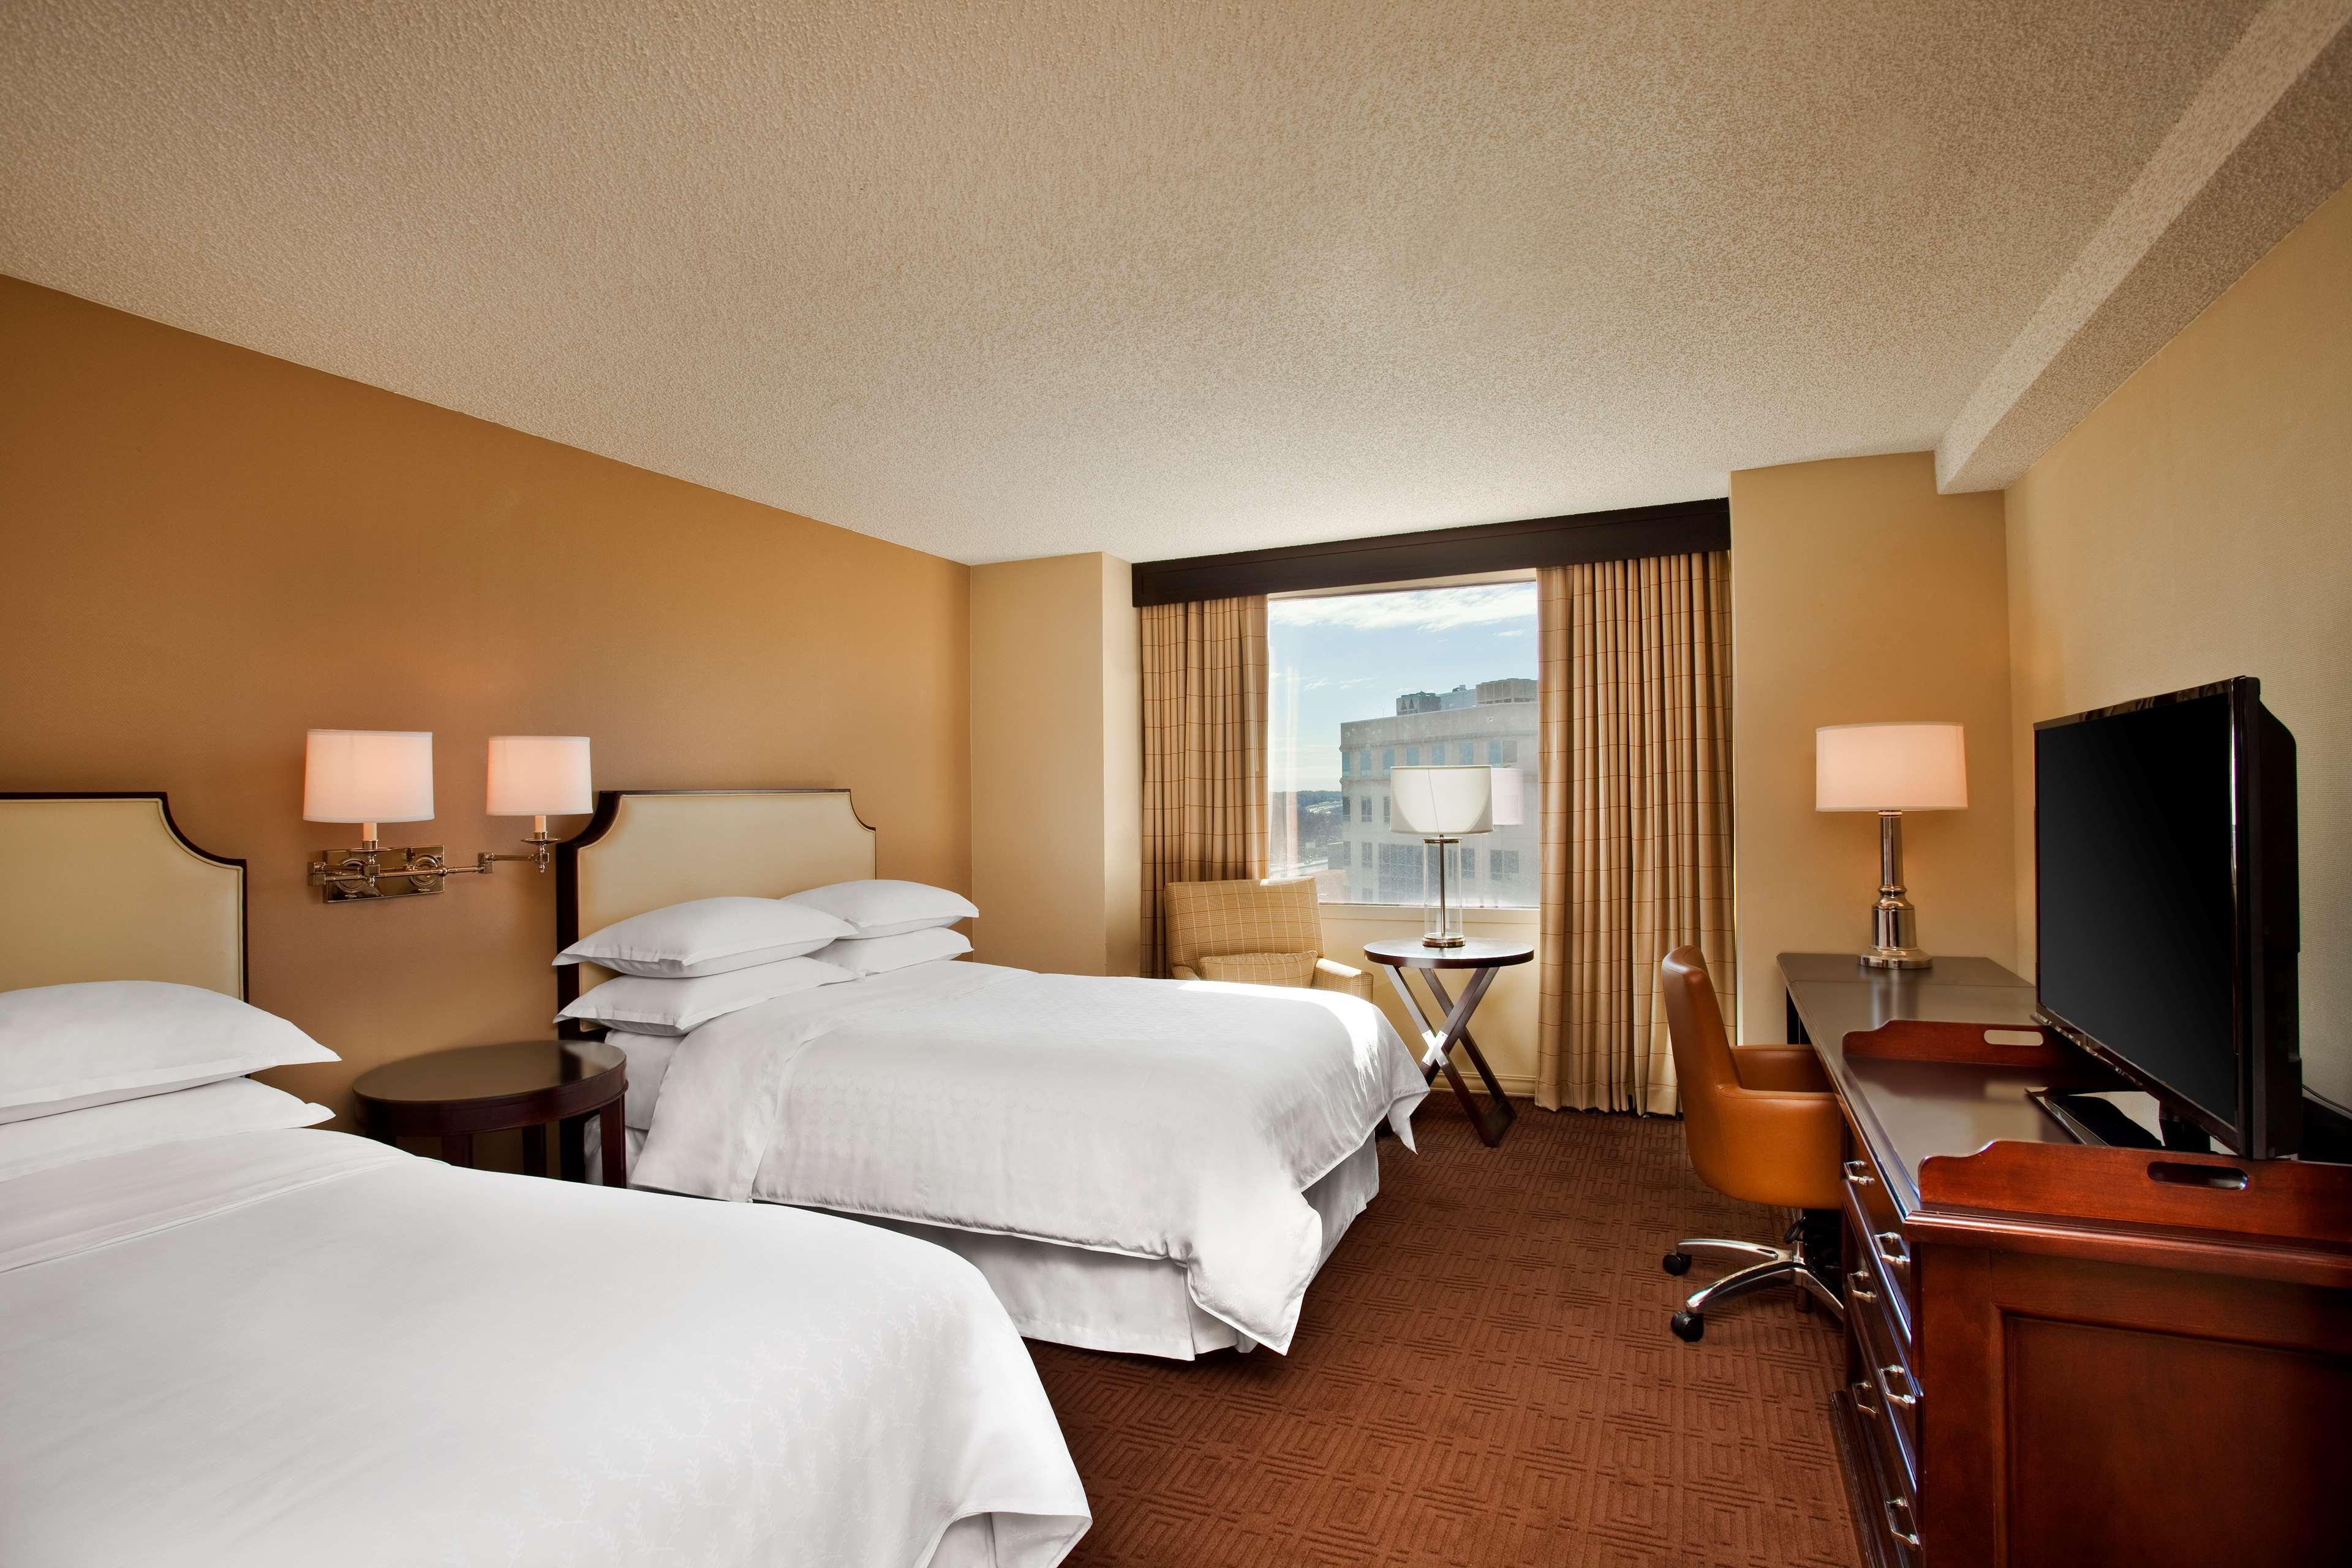 Sheraton hotel coupons